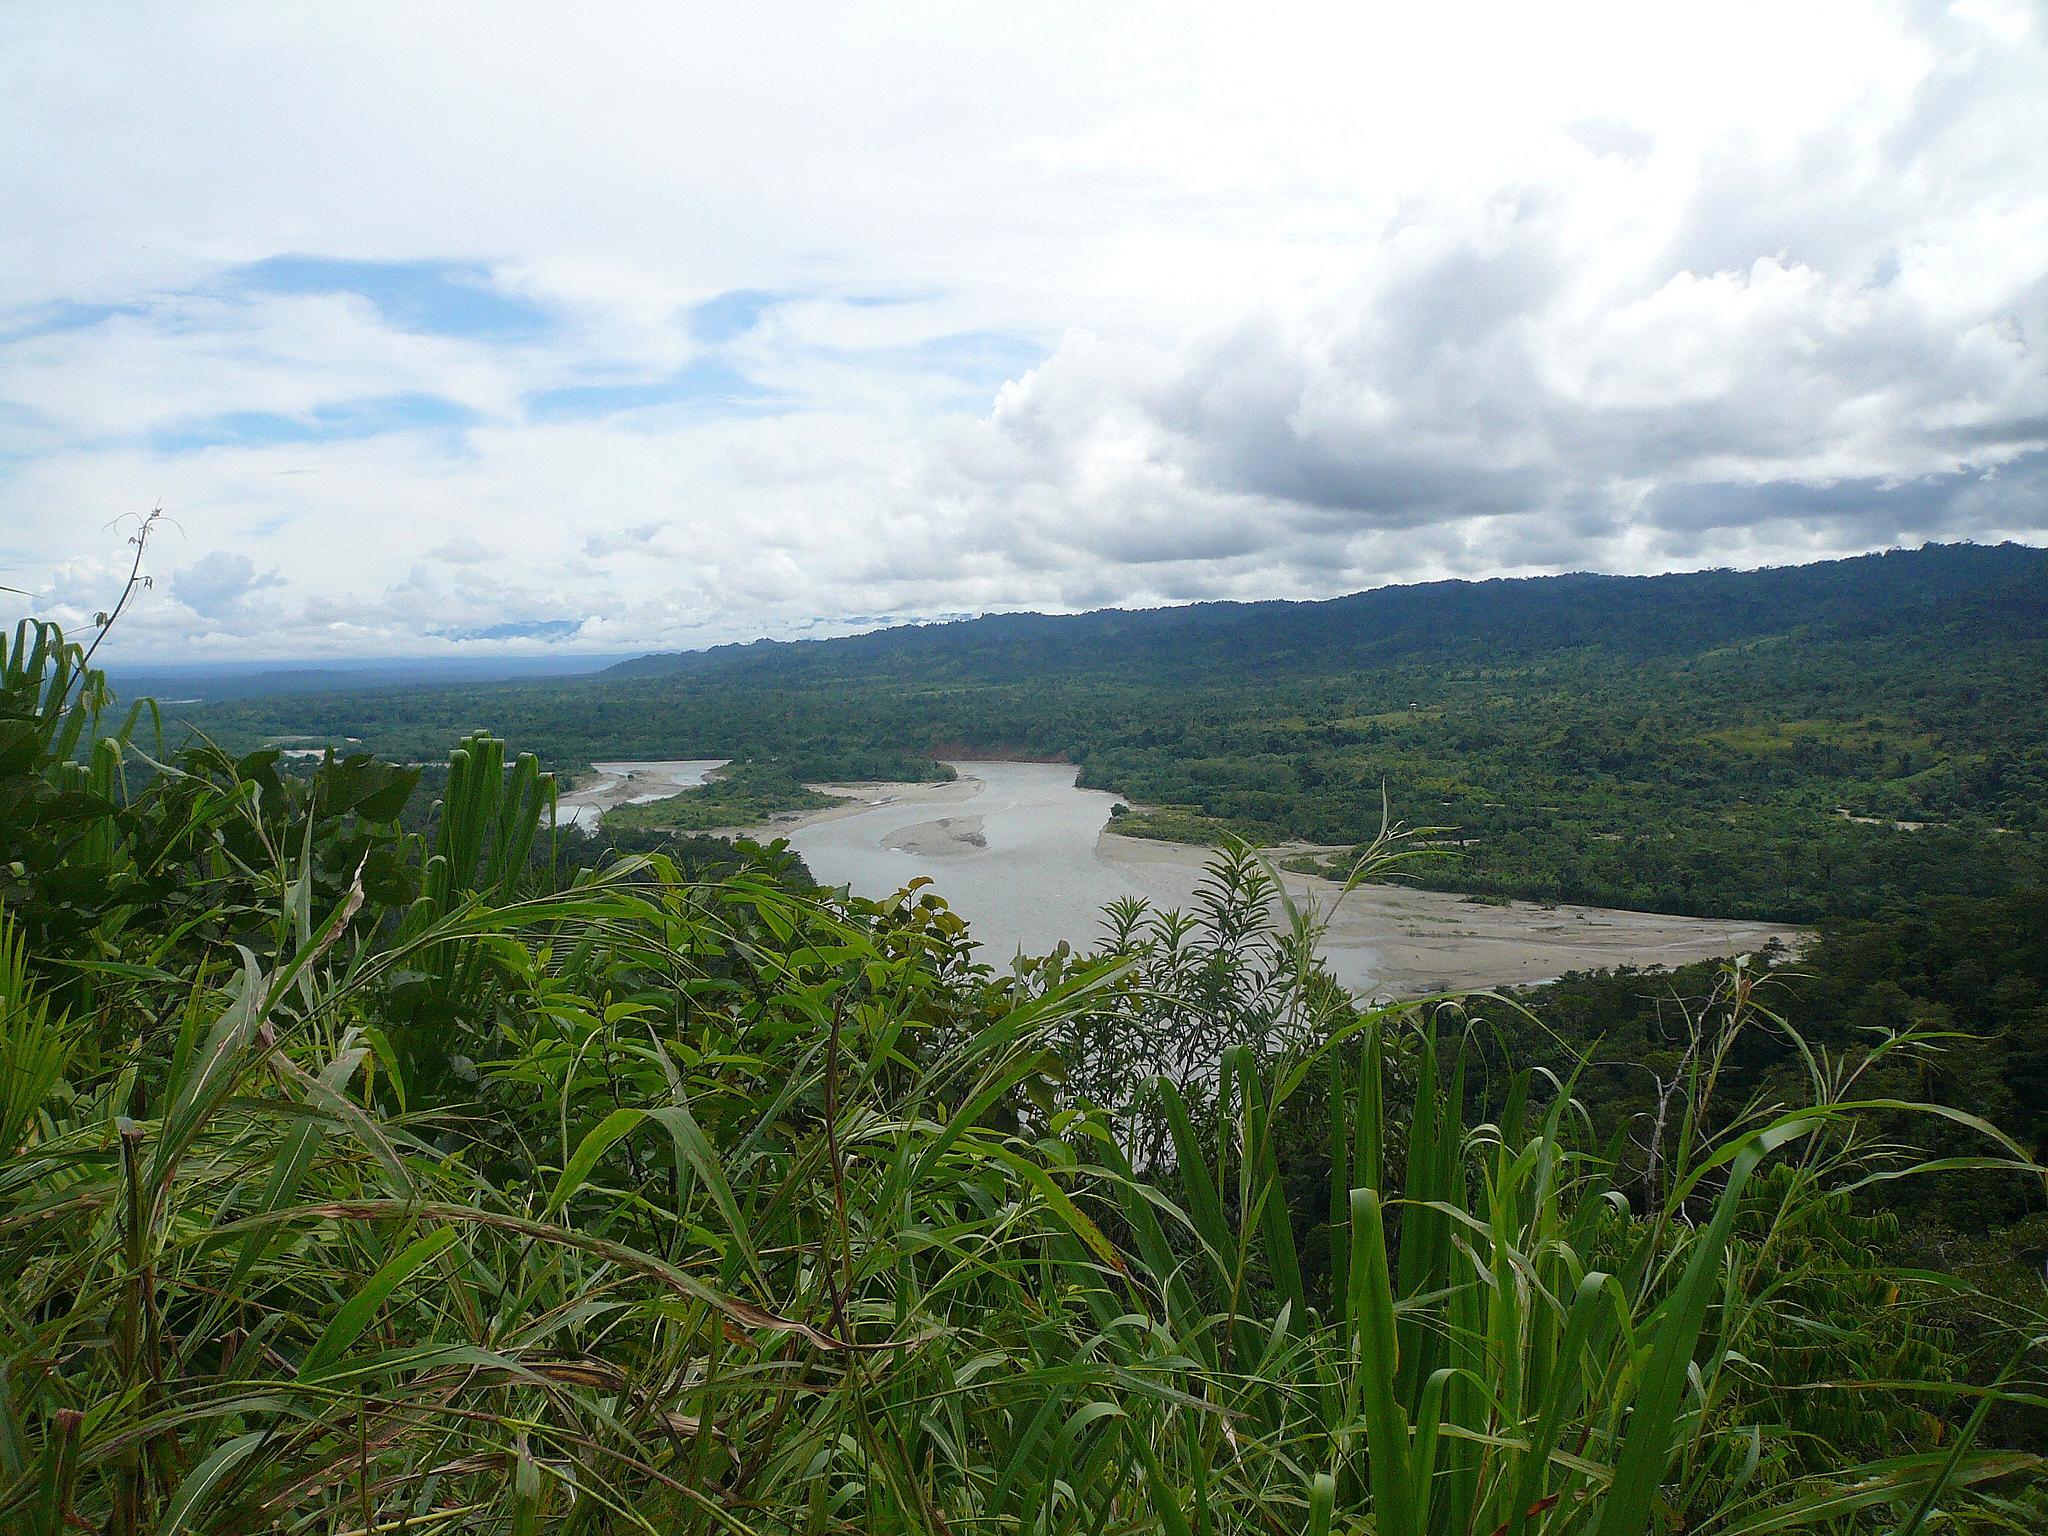 Overlooking the Amazon river.